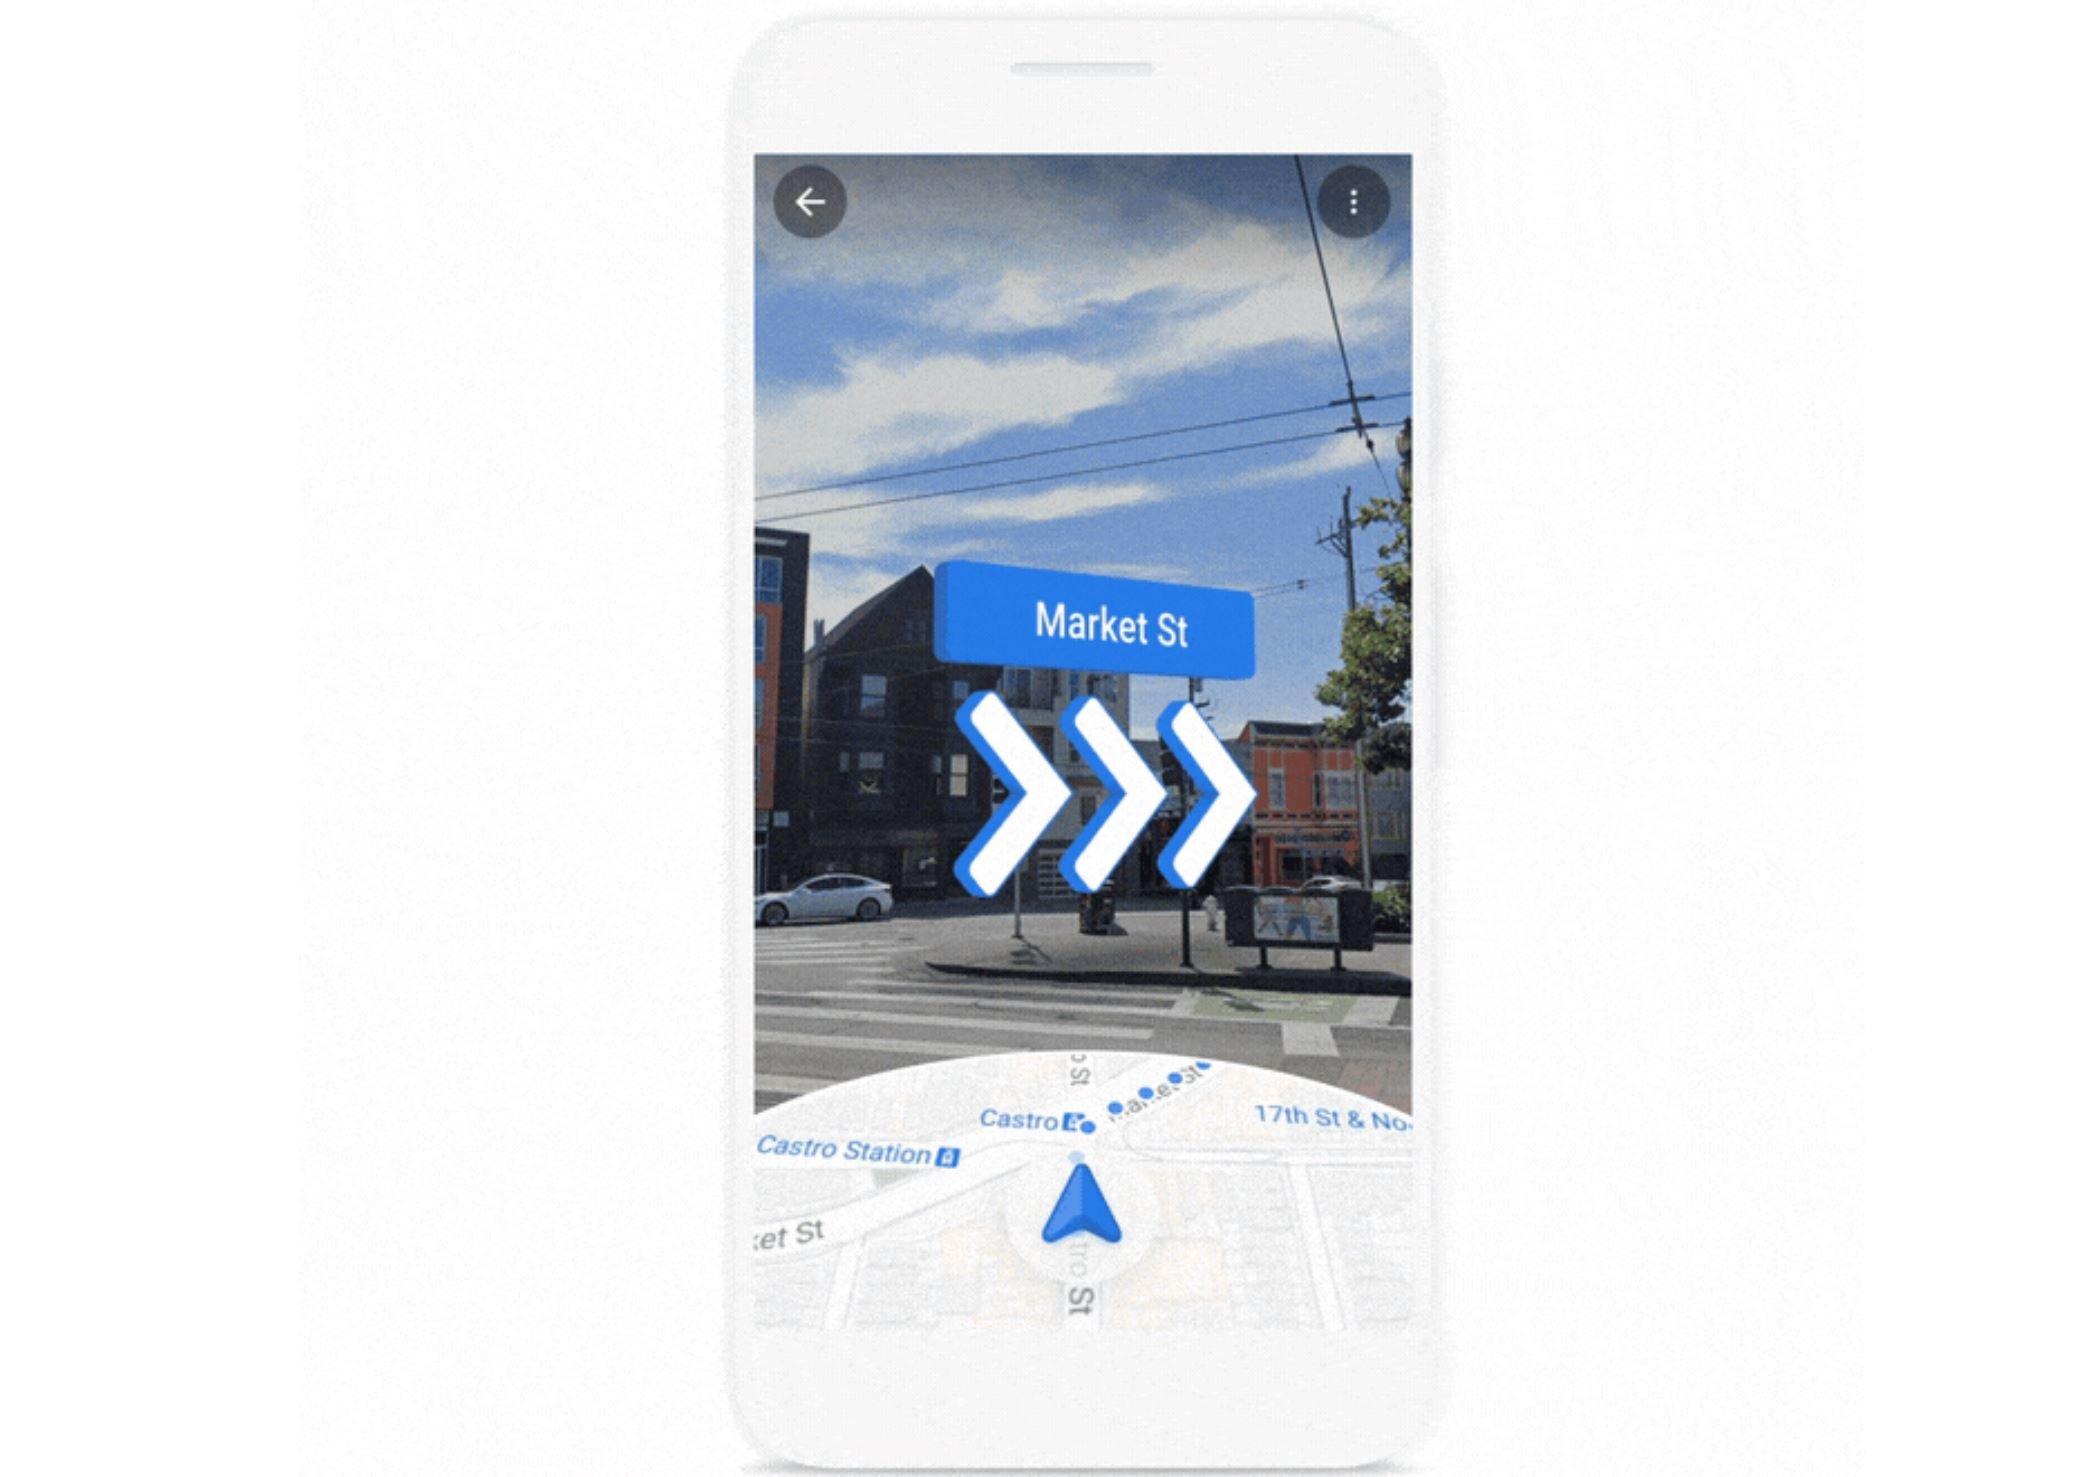 Google-Maps-Live-View-1